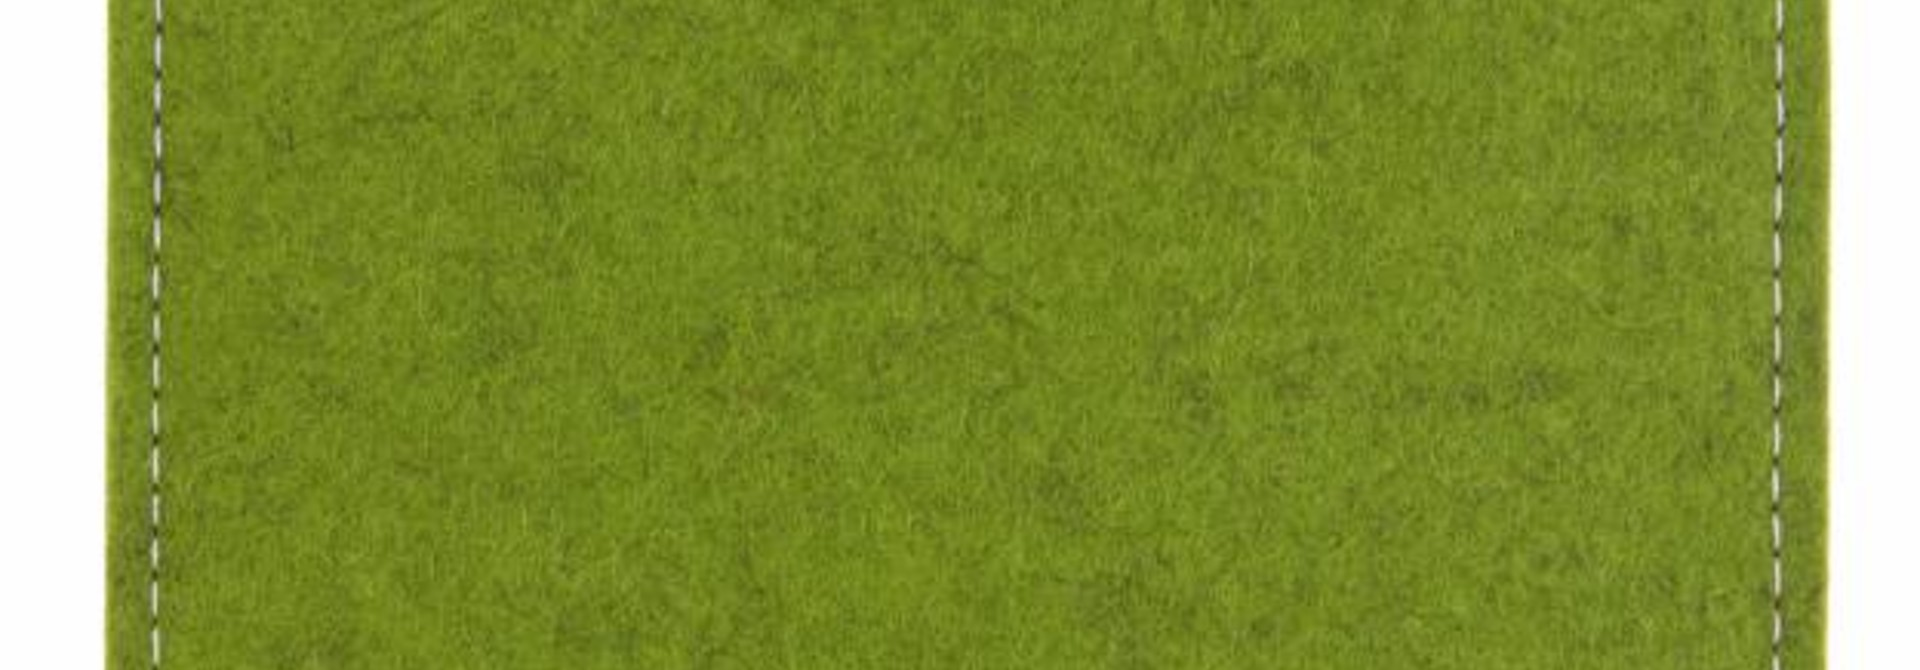 Surface Sleeve Farn-Green